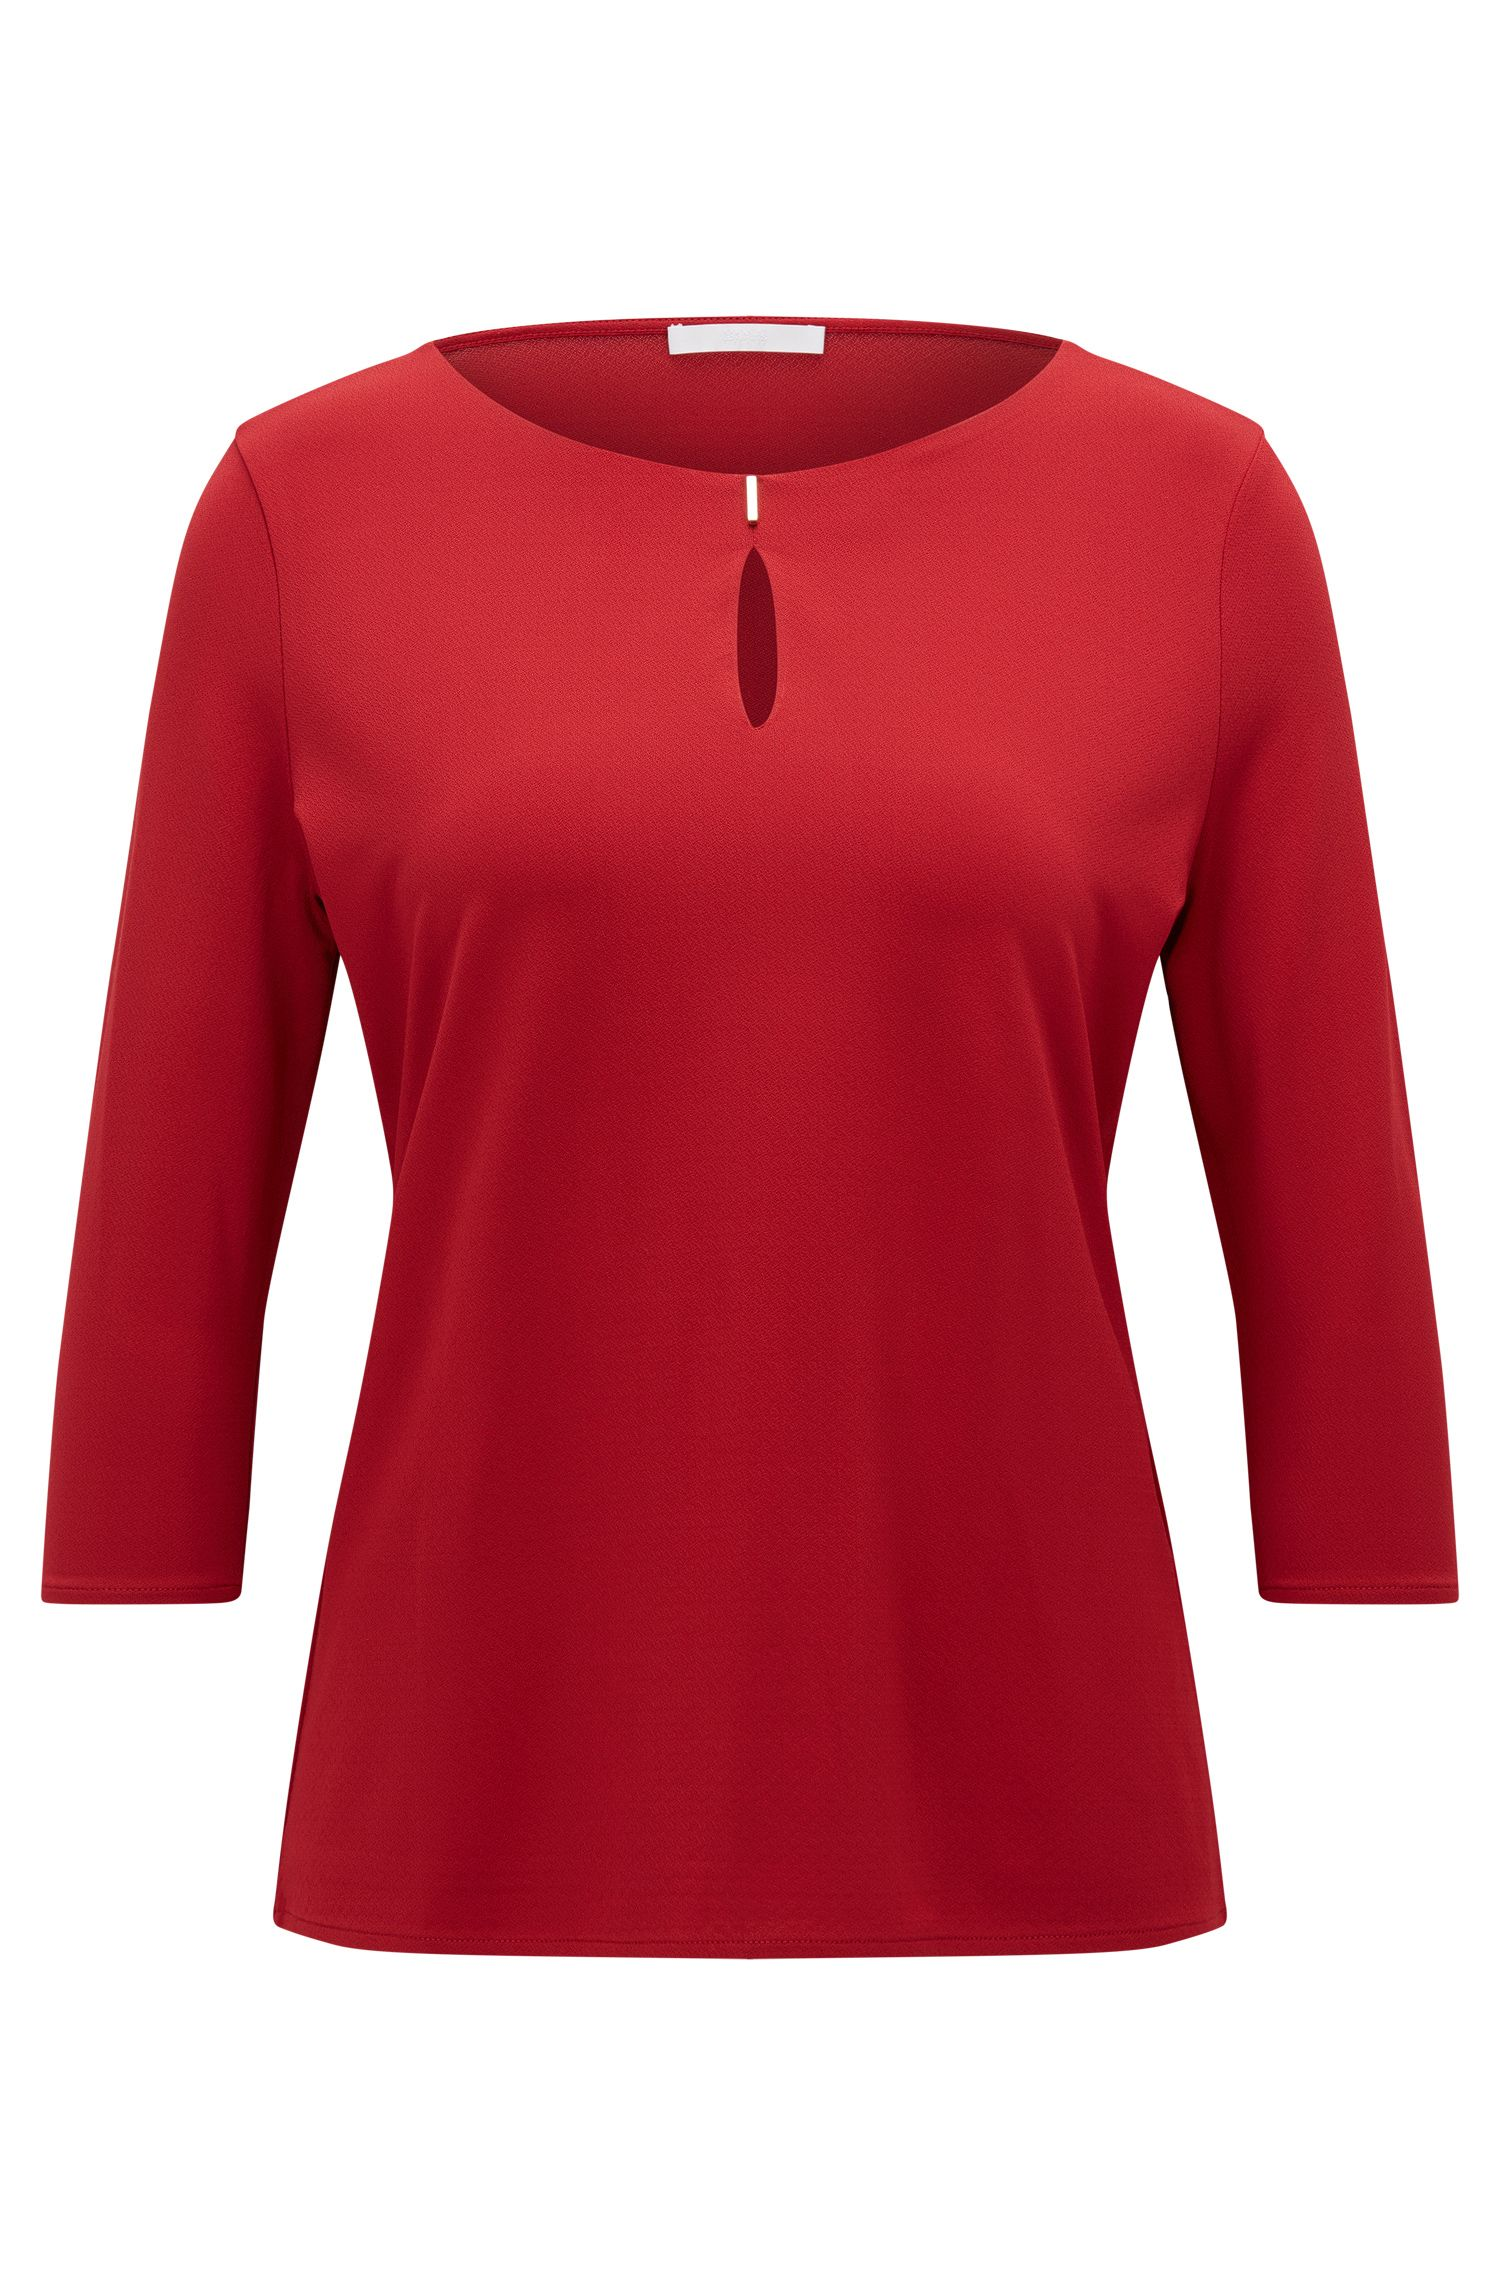 Regular-fit top in stretch crêpe jersey